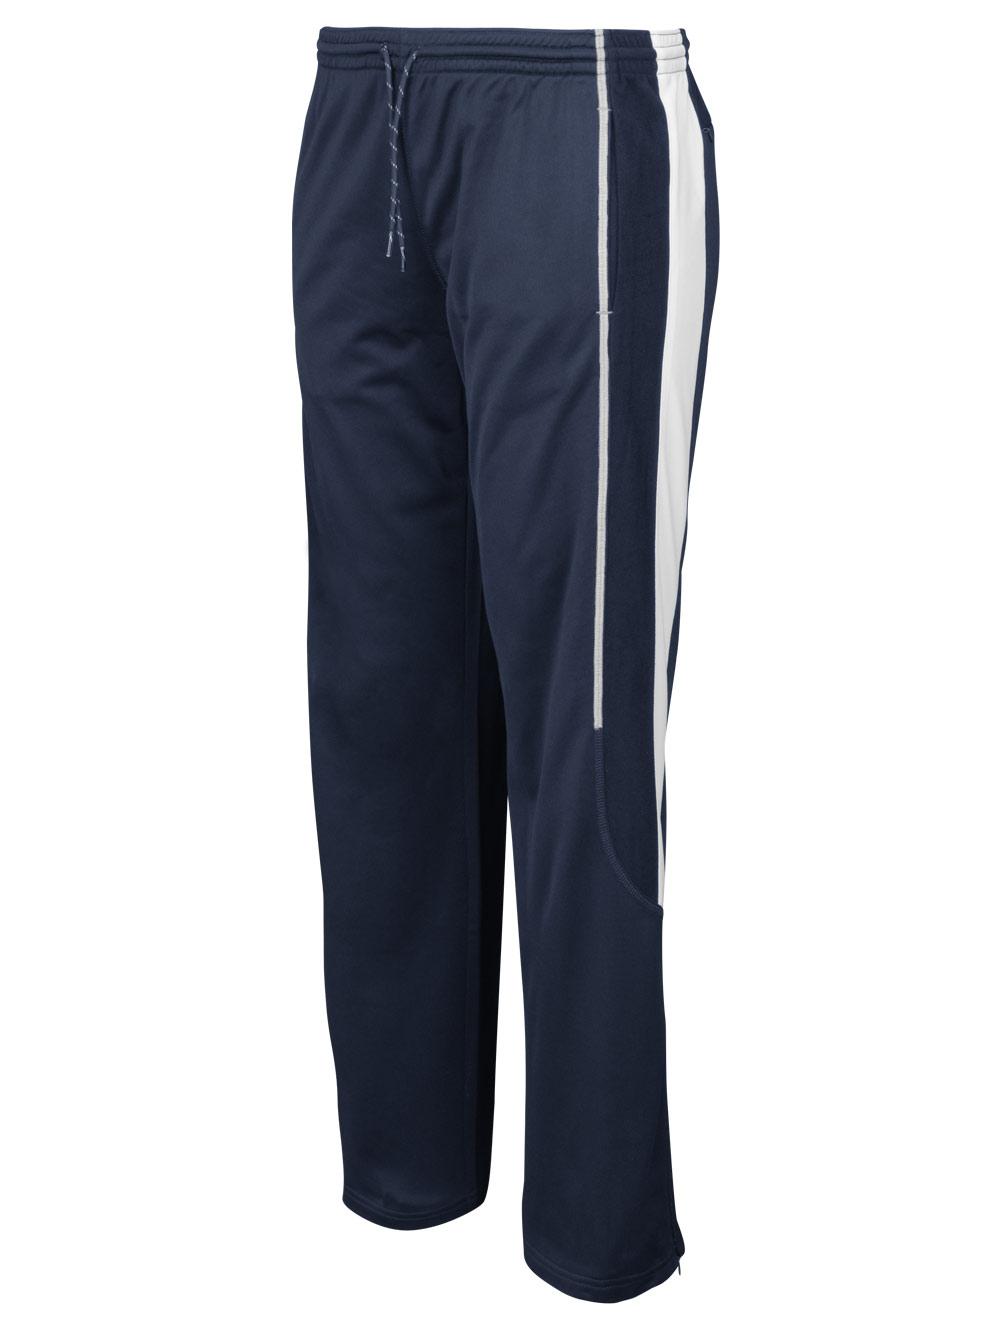 adidas utility pants